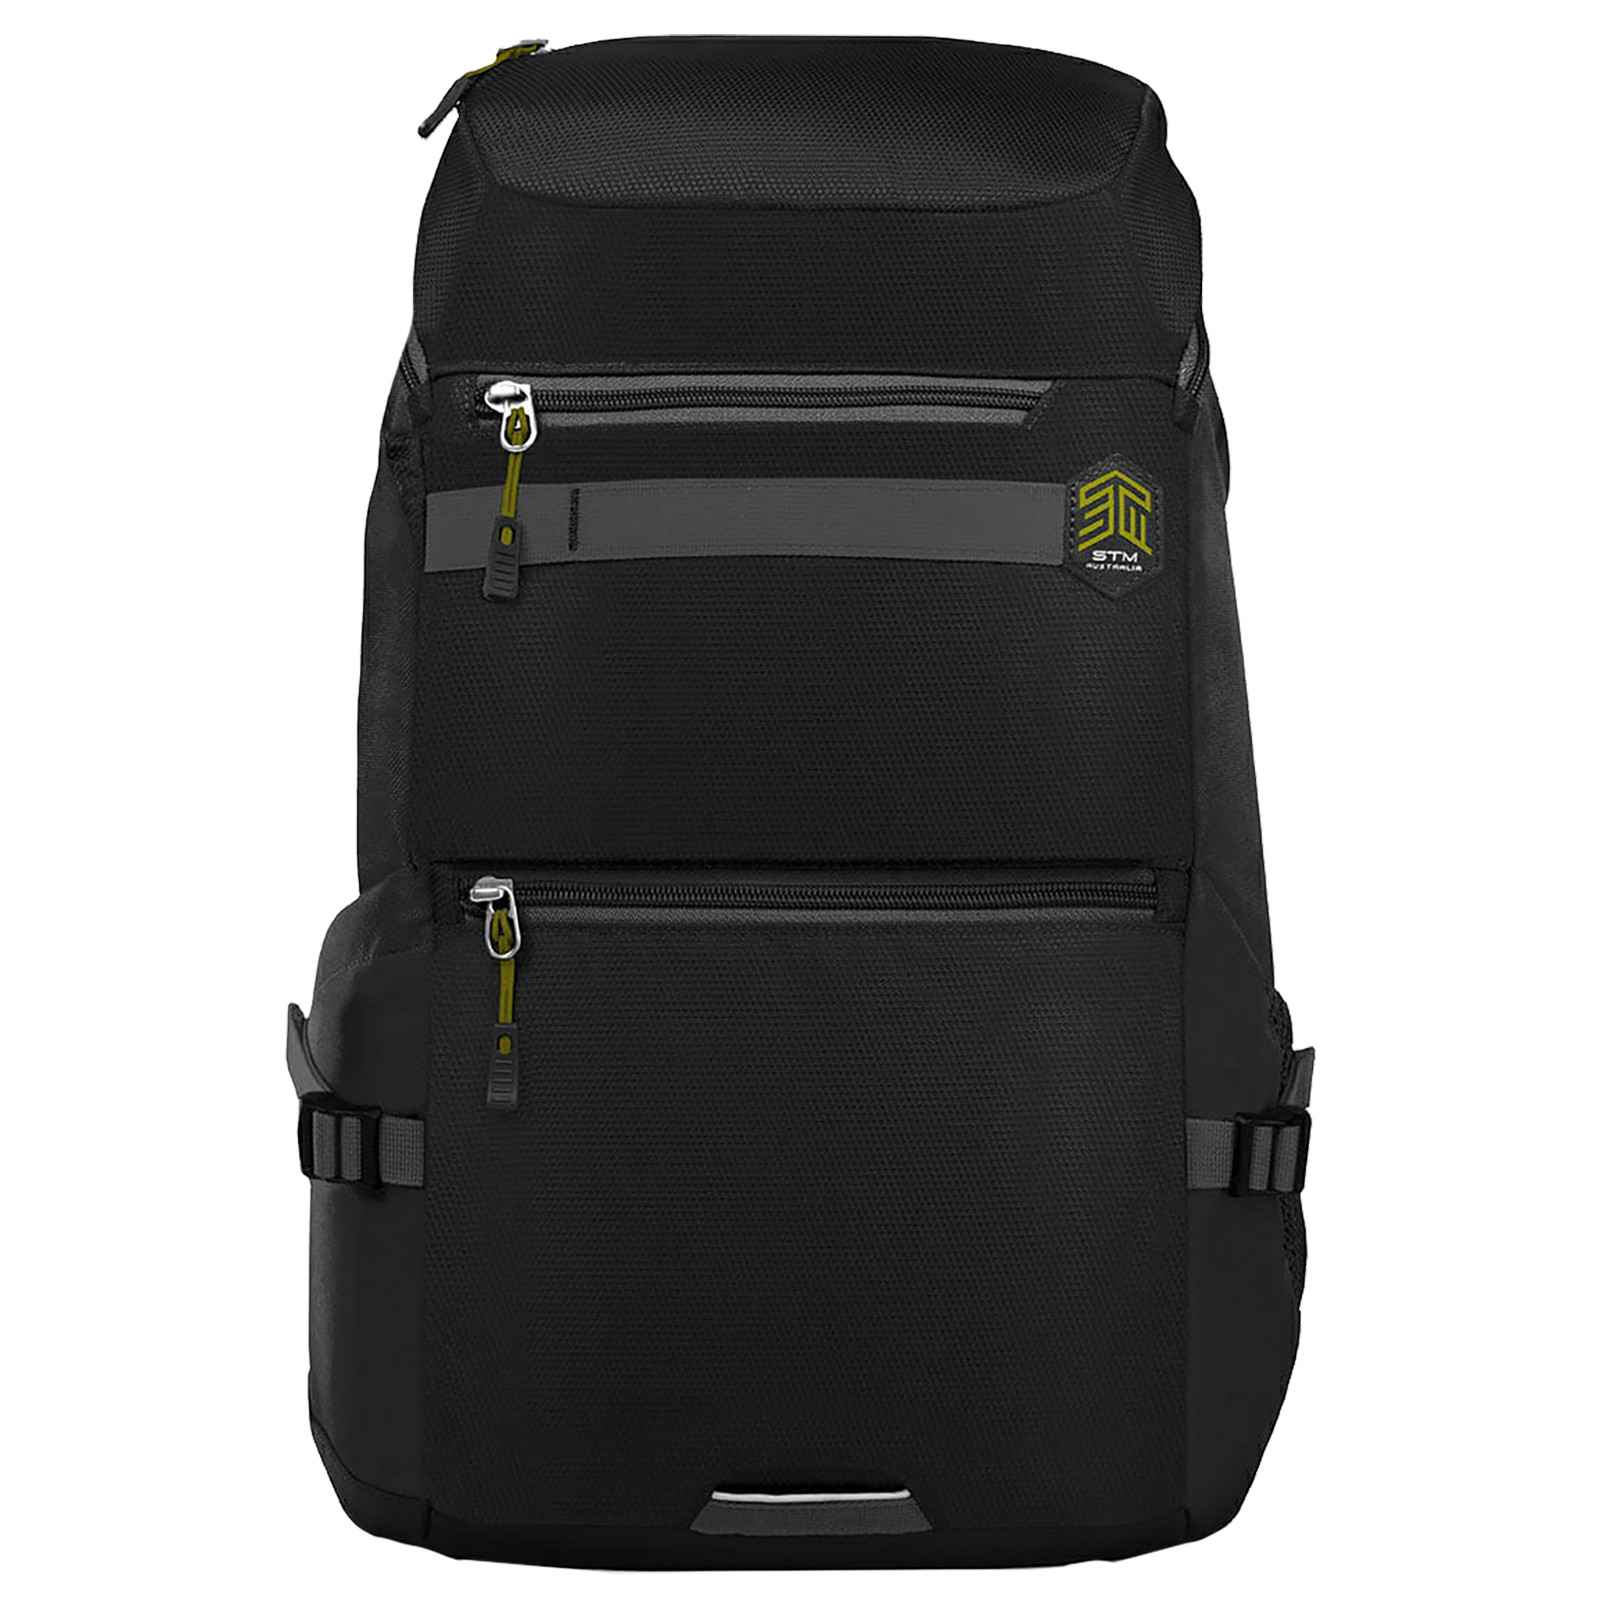 STM Drifter 18 Litres Polyester Backpack for 15 Inch Laptop (3D Foam Mesh Back Panel, STM-111-192P-01, Black)_1